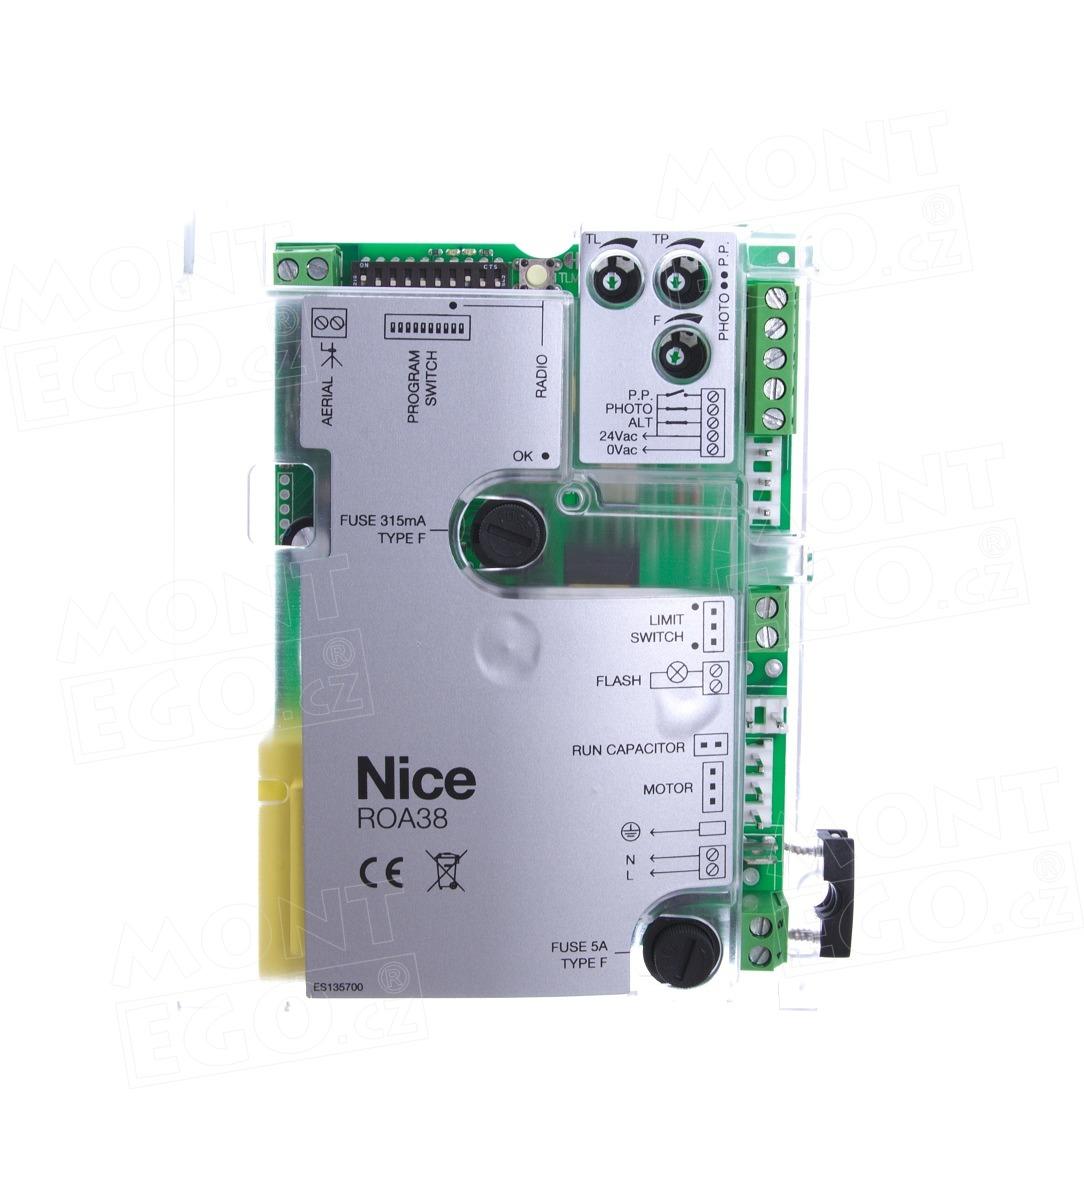 Nice ROA38 náhradní elektronika pro pohony posuvné brány Nice ROX600